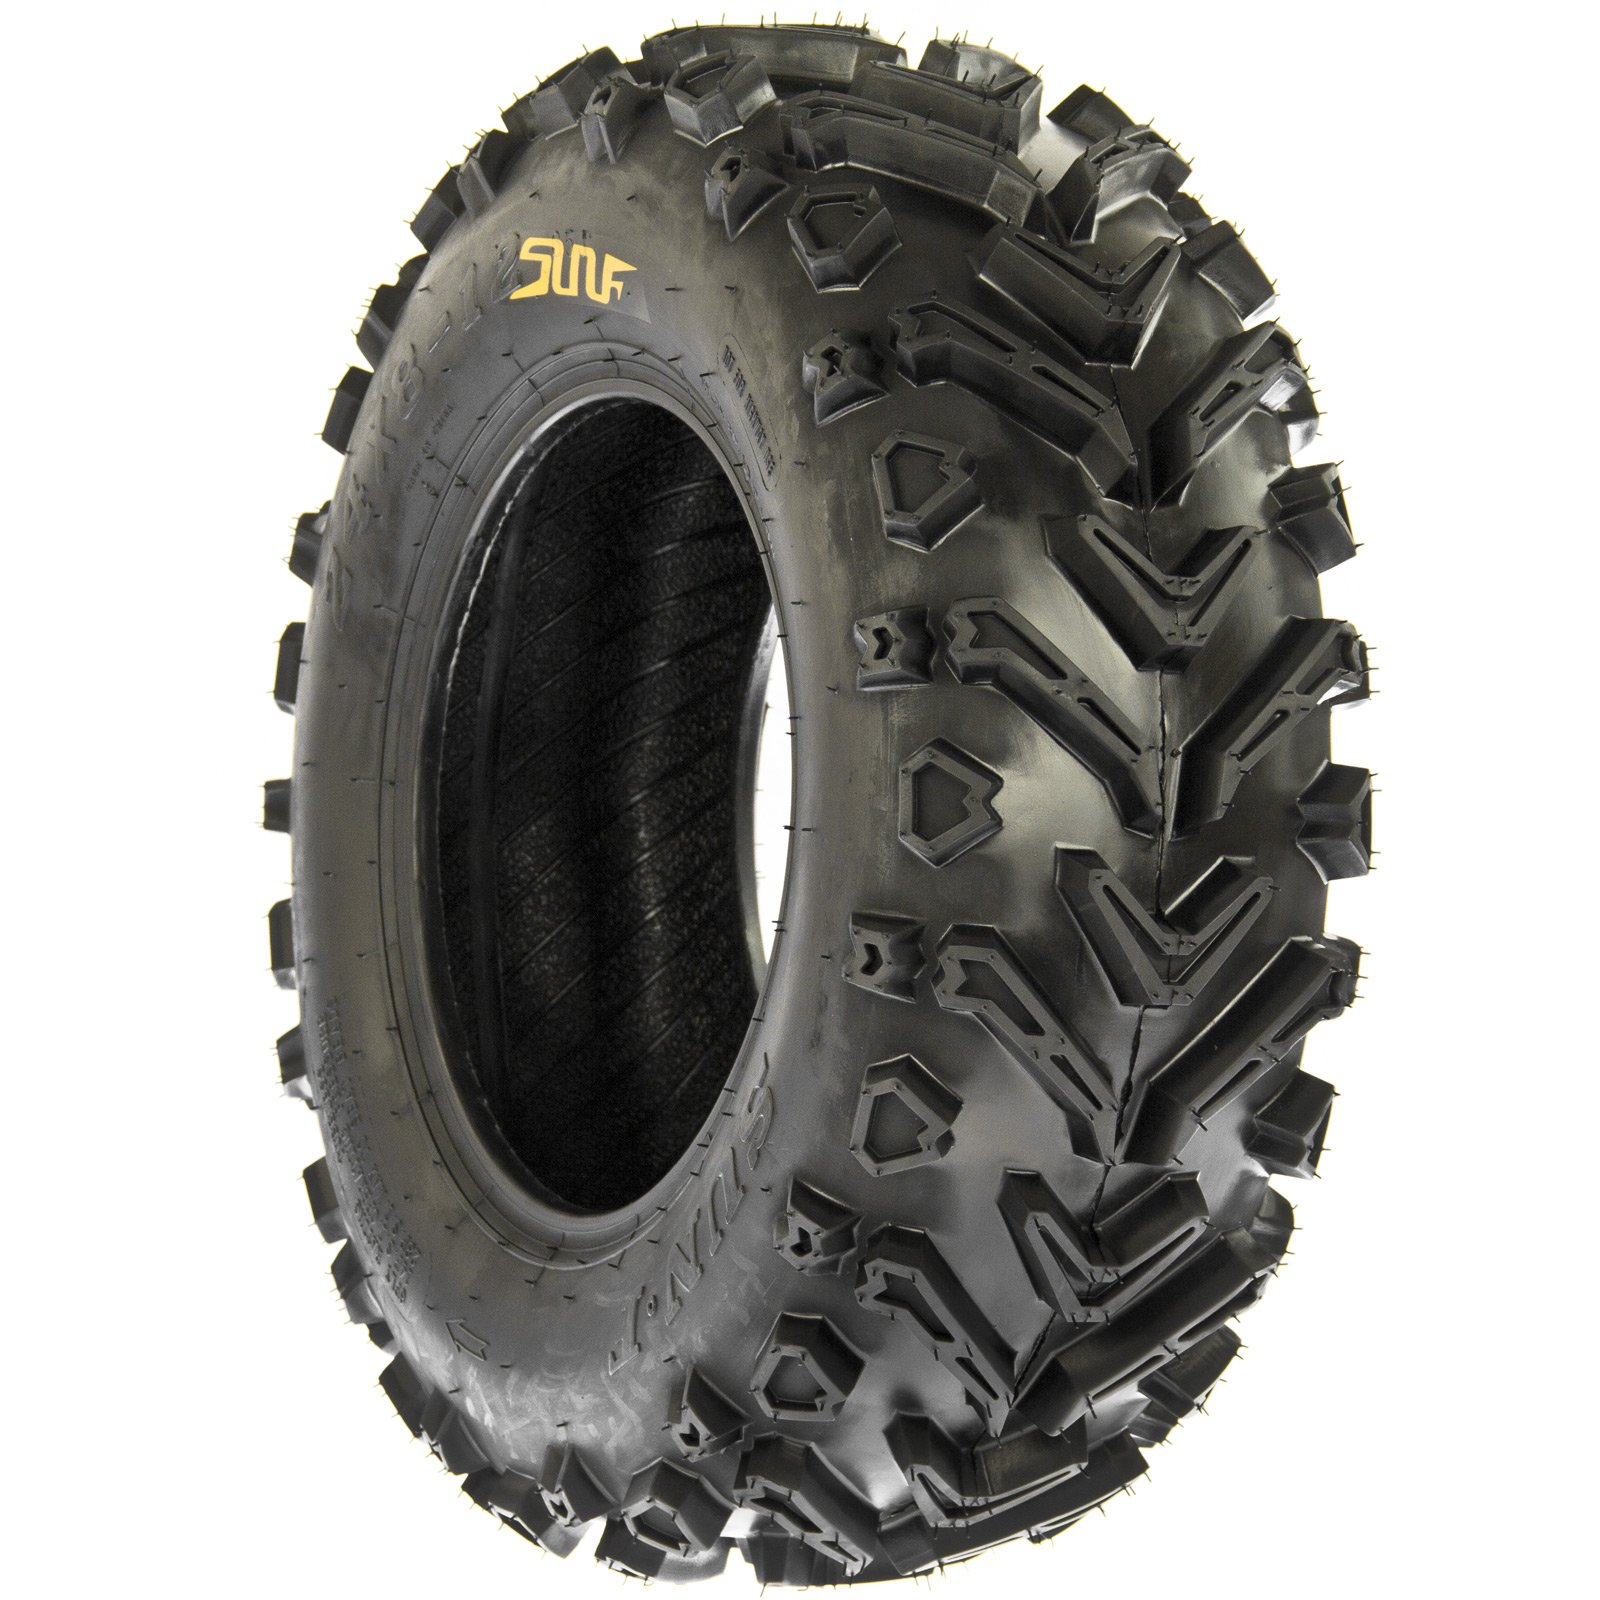 SunF 24x8-12 24x8x12 All Terrain Mud ATV UTV Tires 6 PR A041 (Set pair of 2) by SunF (Image #5)